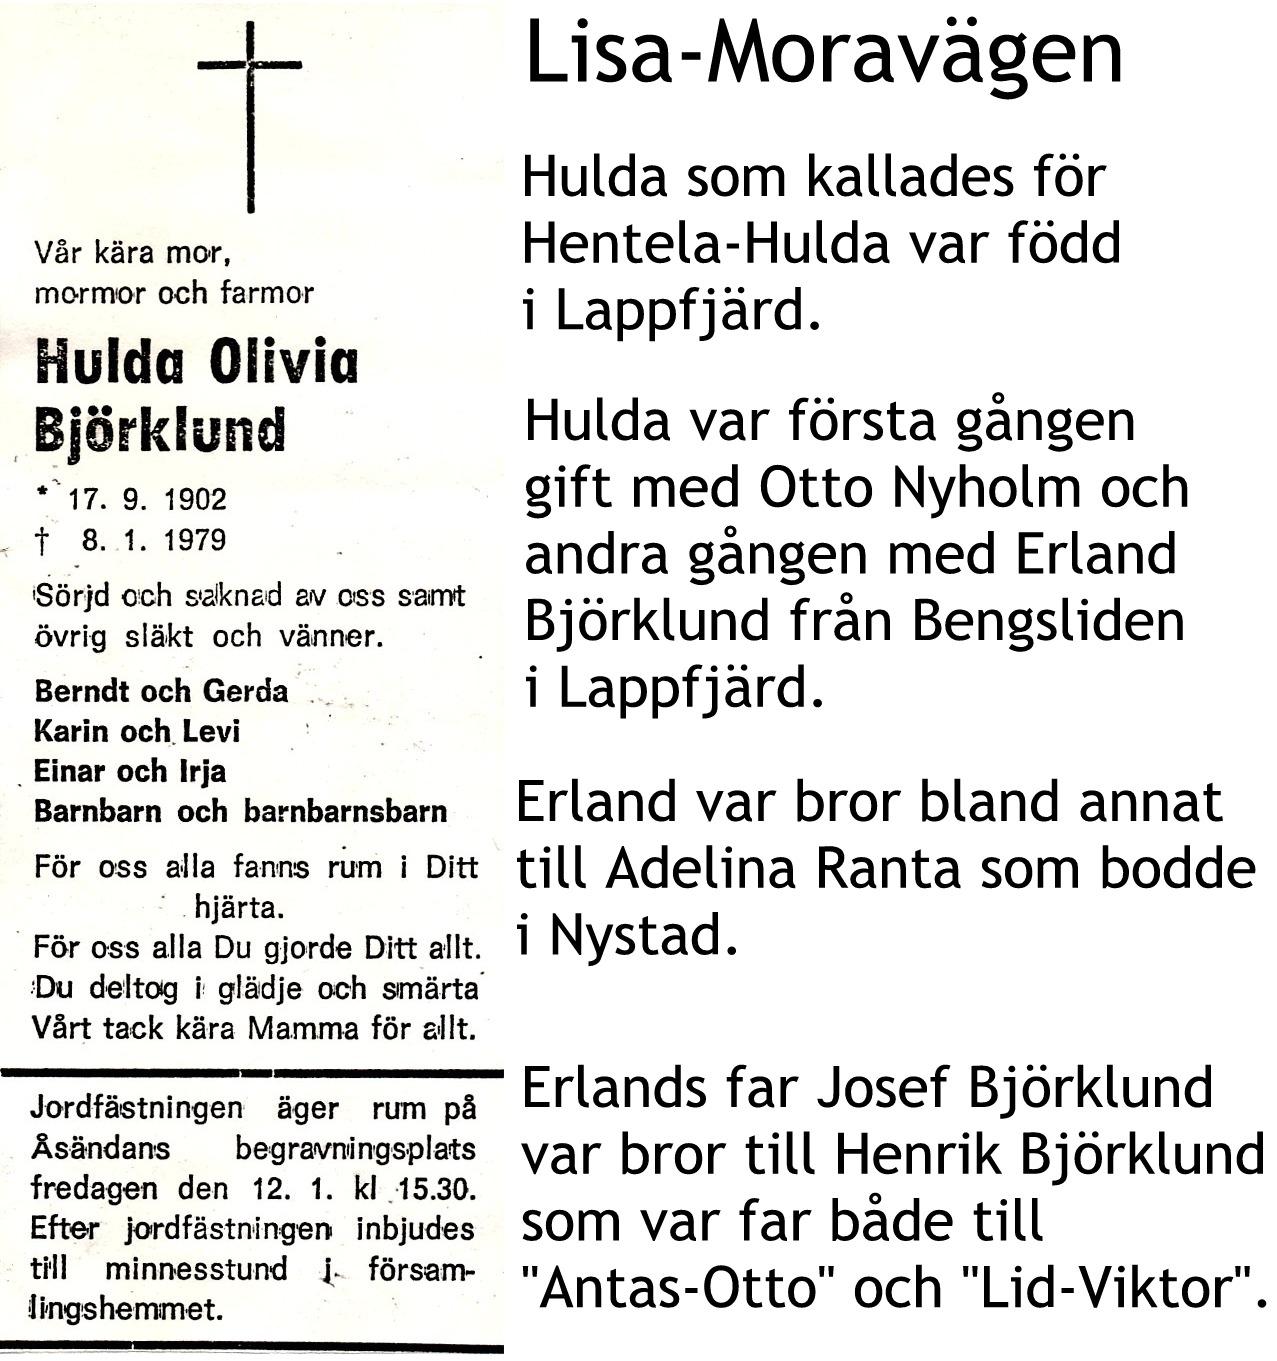 Björklund Hulda, Hentela